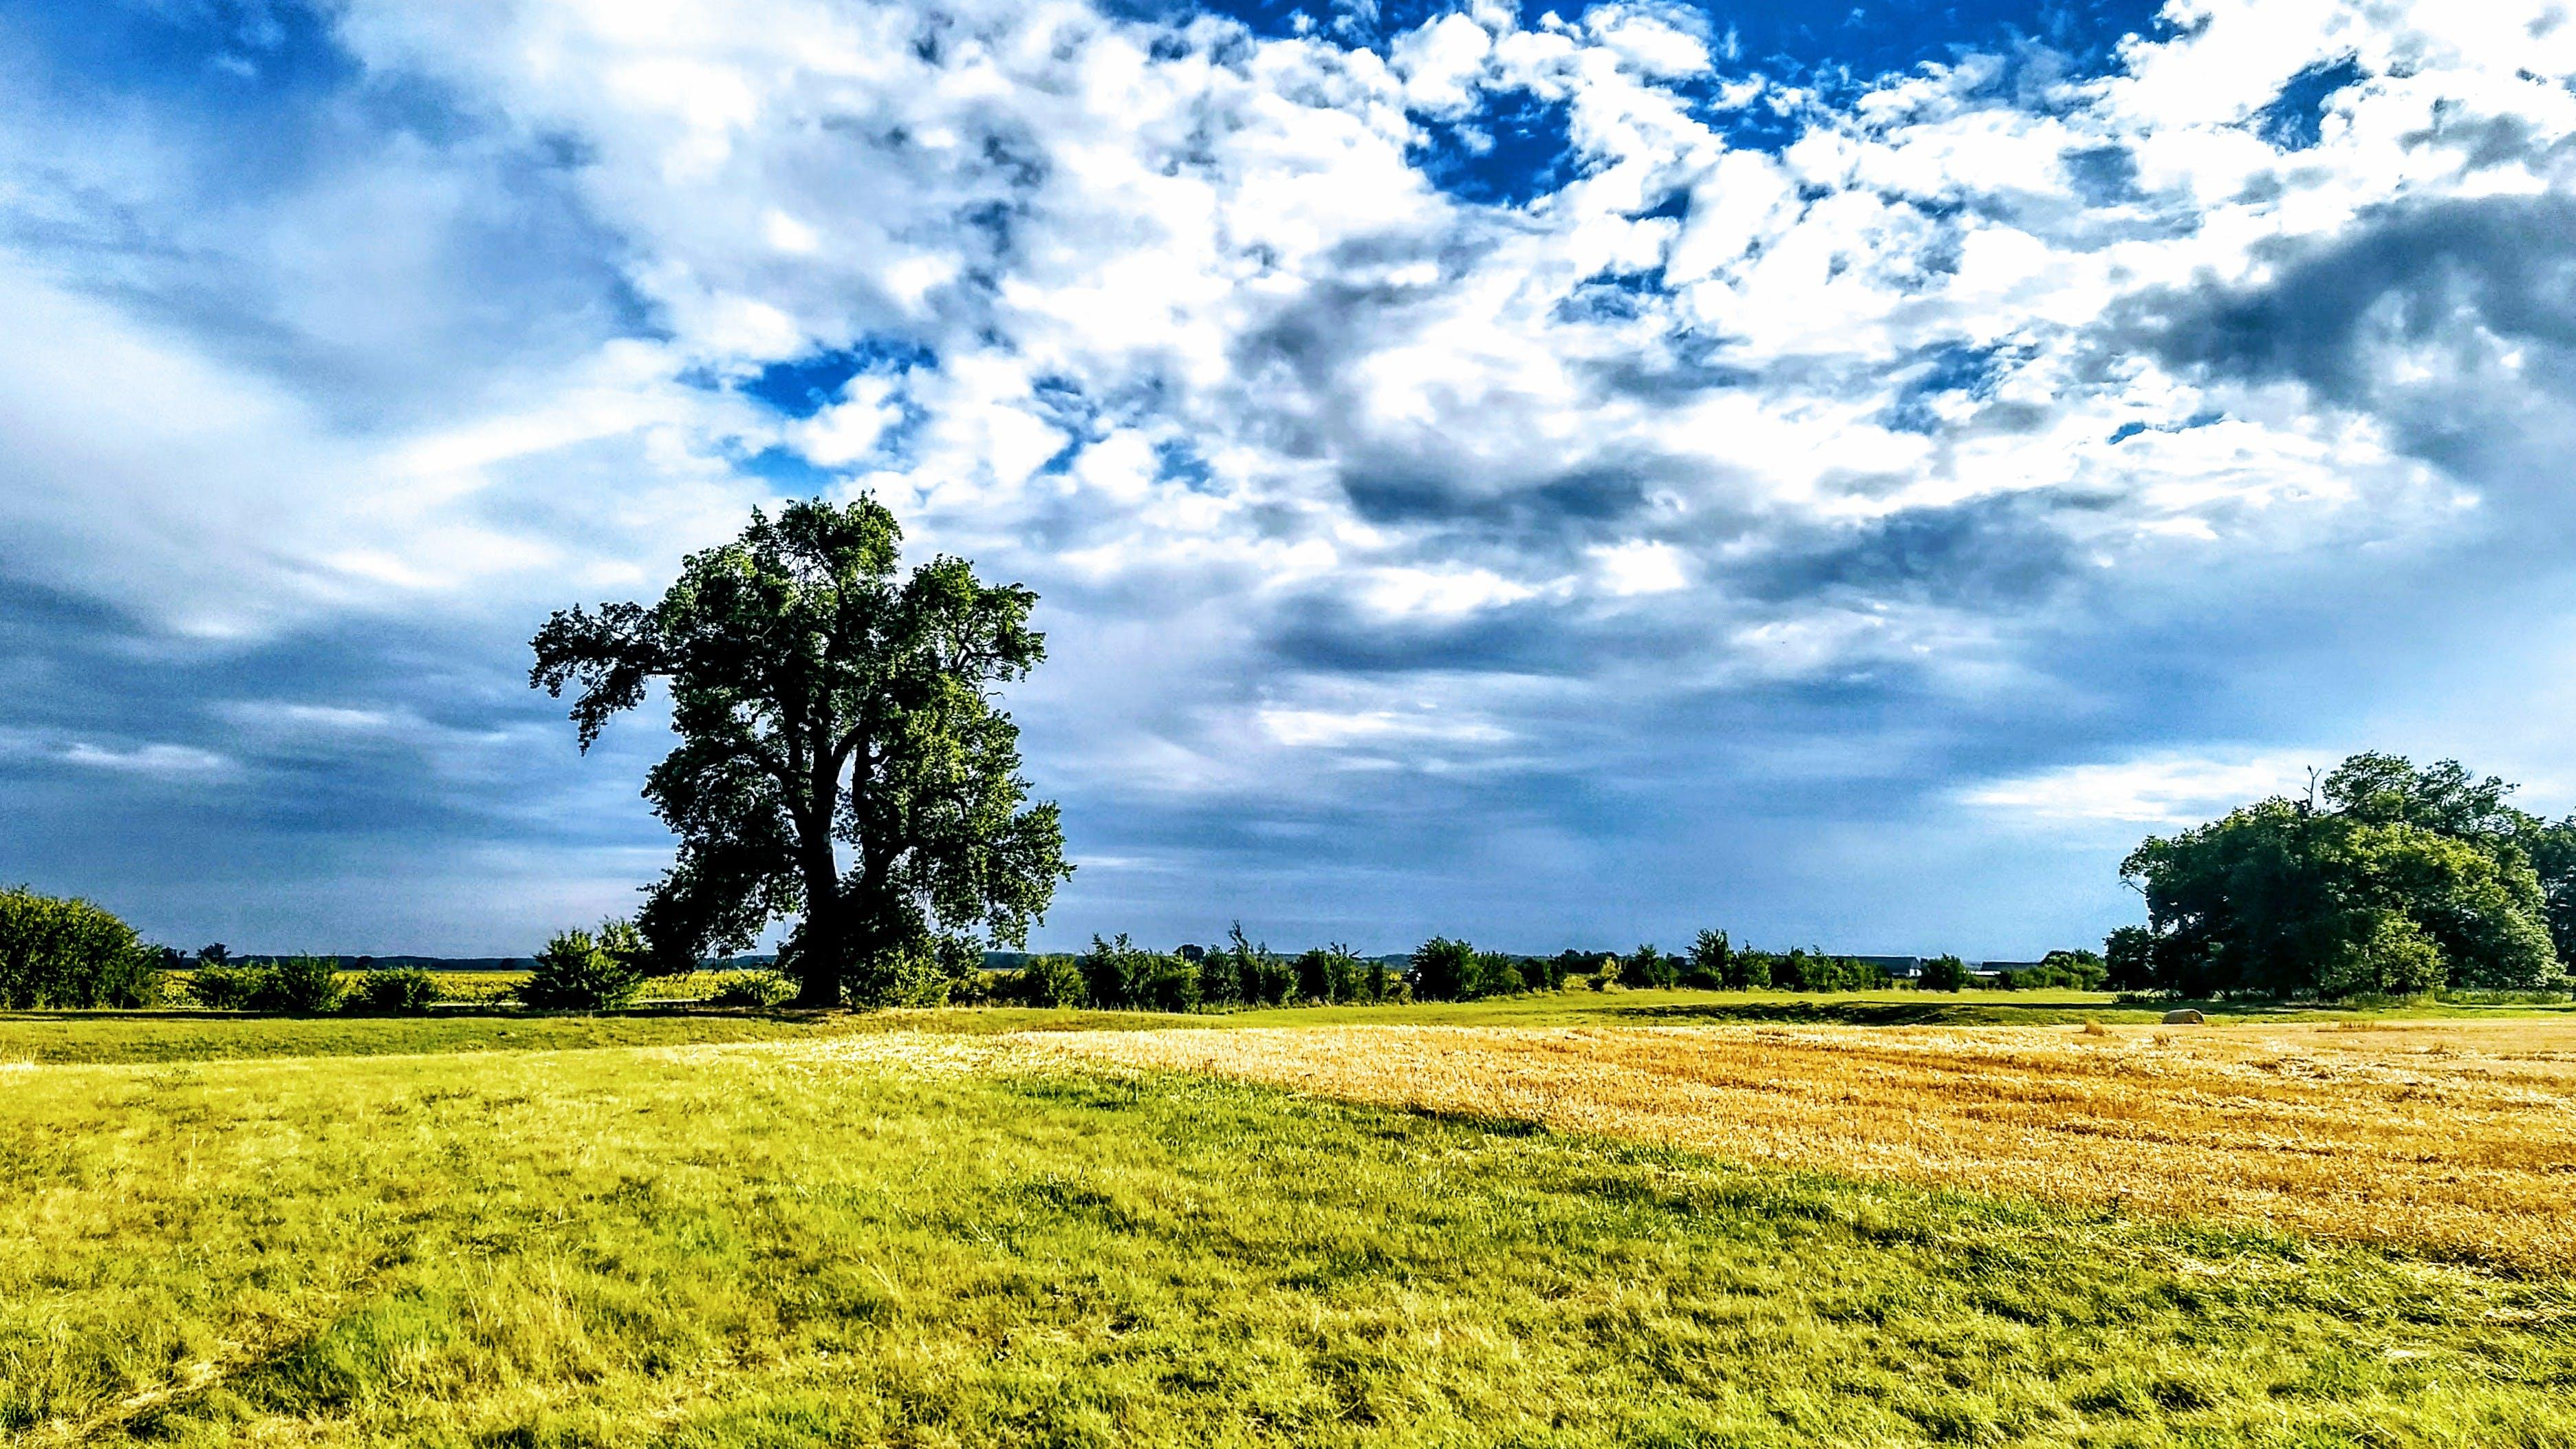 Foto stok gratis alam, awan, bidang, hijau